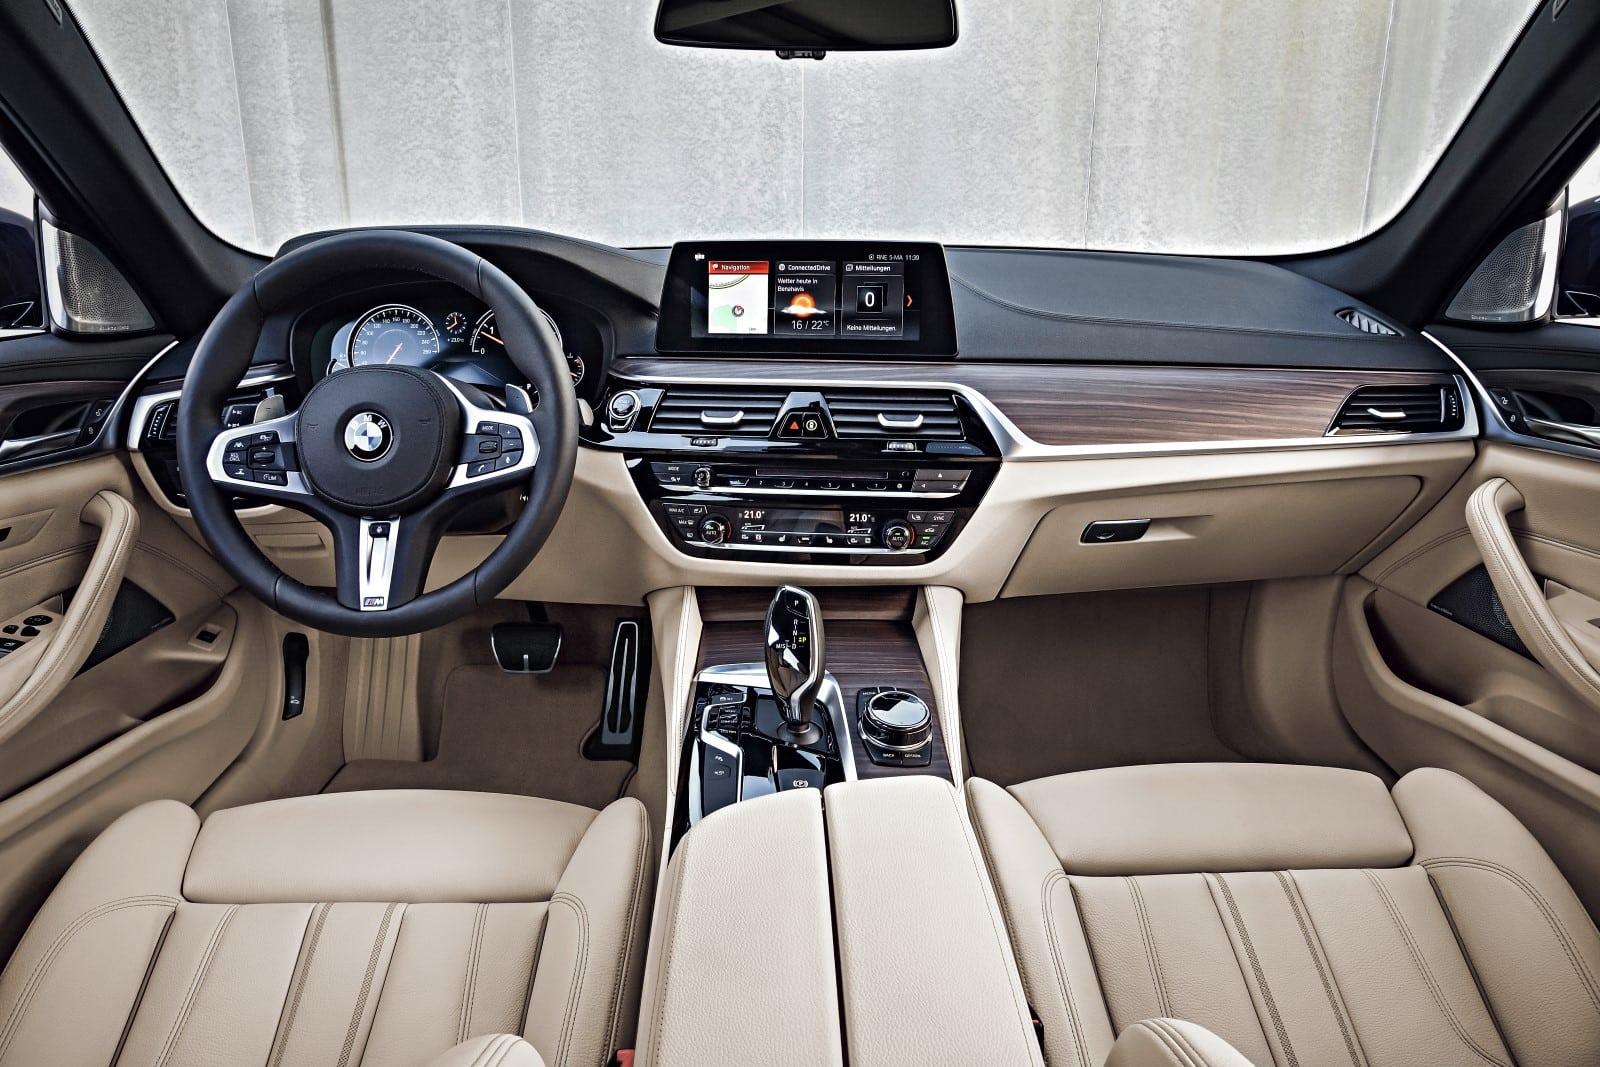 BMW 5 Series 530d G30 Touring Interior